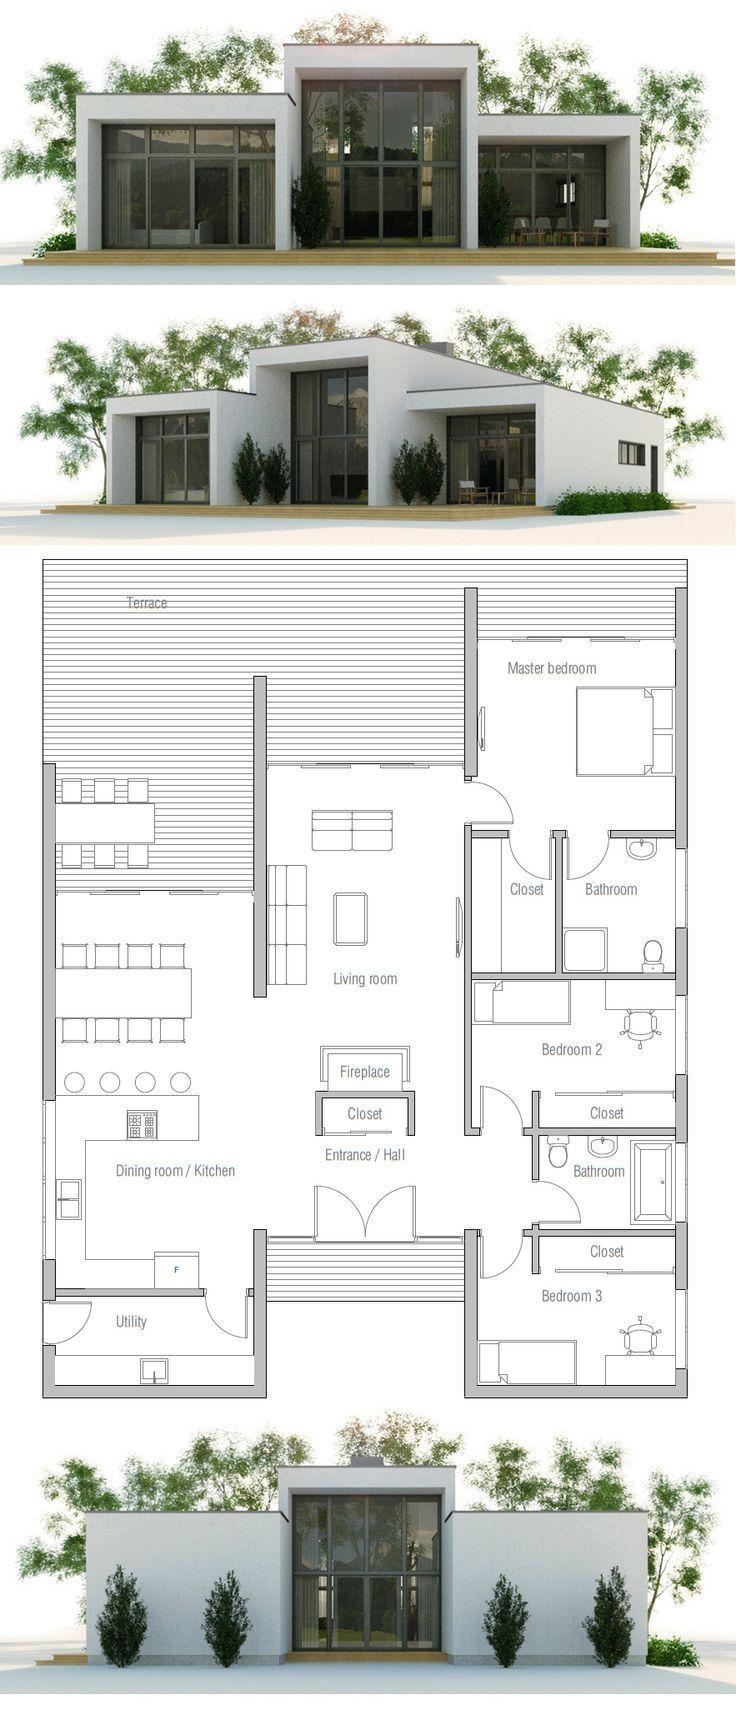 خطط منزلية مجانية Container House Plans Modern Minimalist House Minimalist House Design